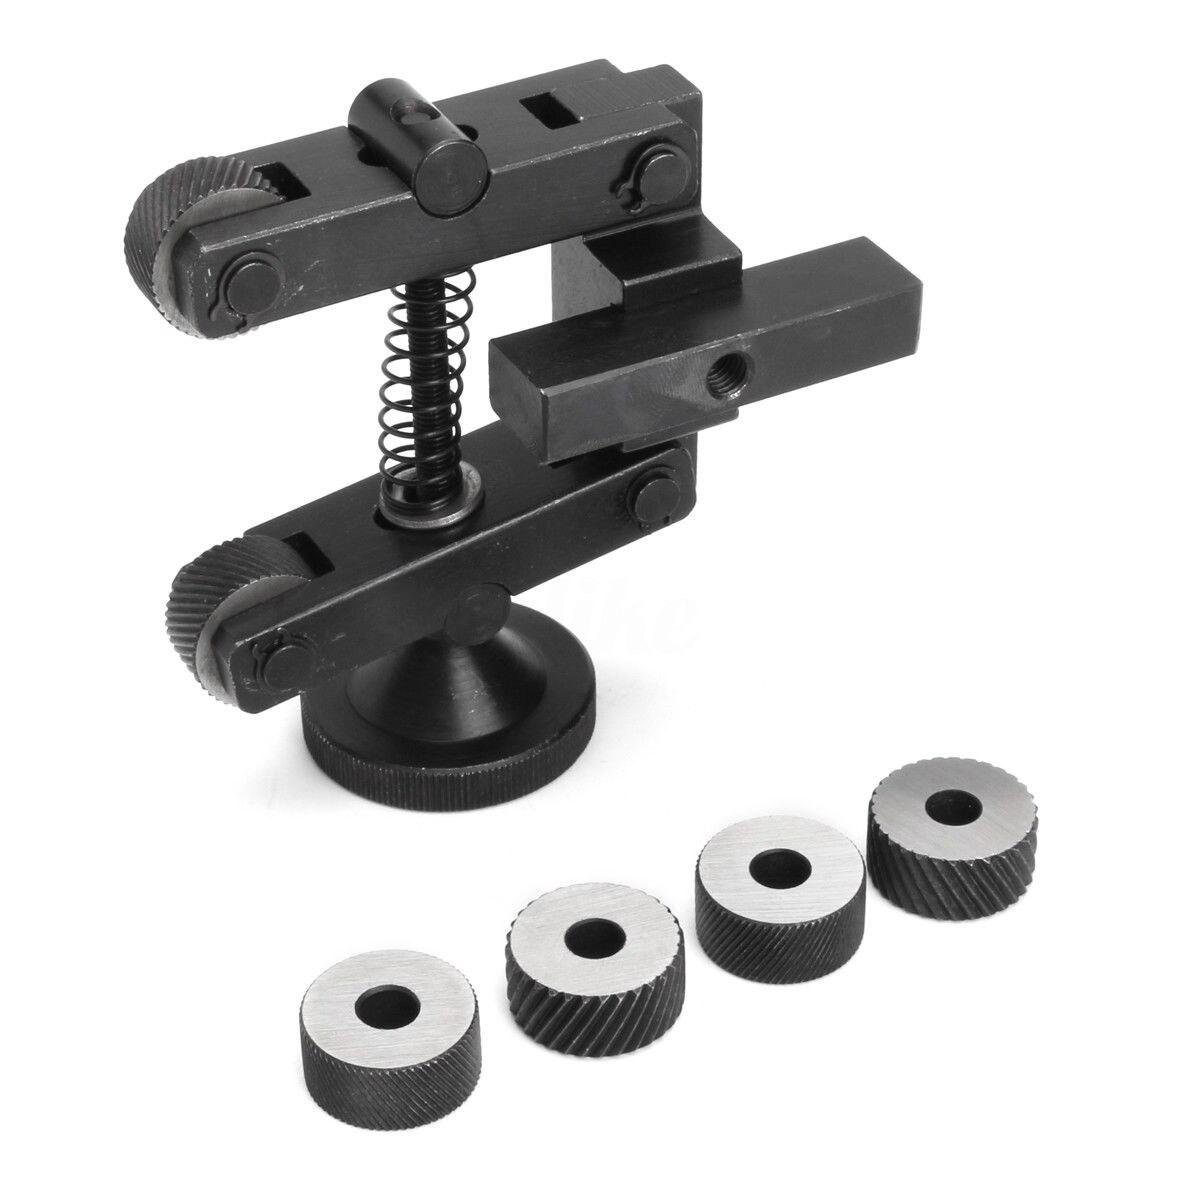 Mayitr Carbon Steel Knurling Tool Holder Linear Knurl Tools Adjustable Shank + 6pcs Wheel 20mm For Mini Lathe Spindle Bearings